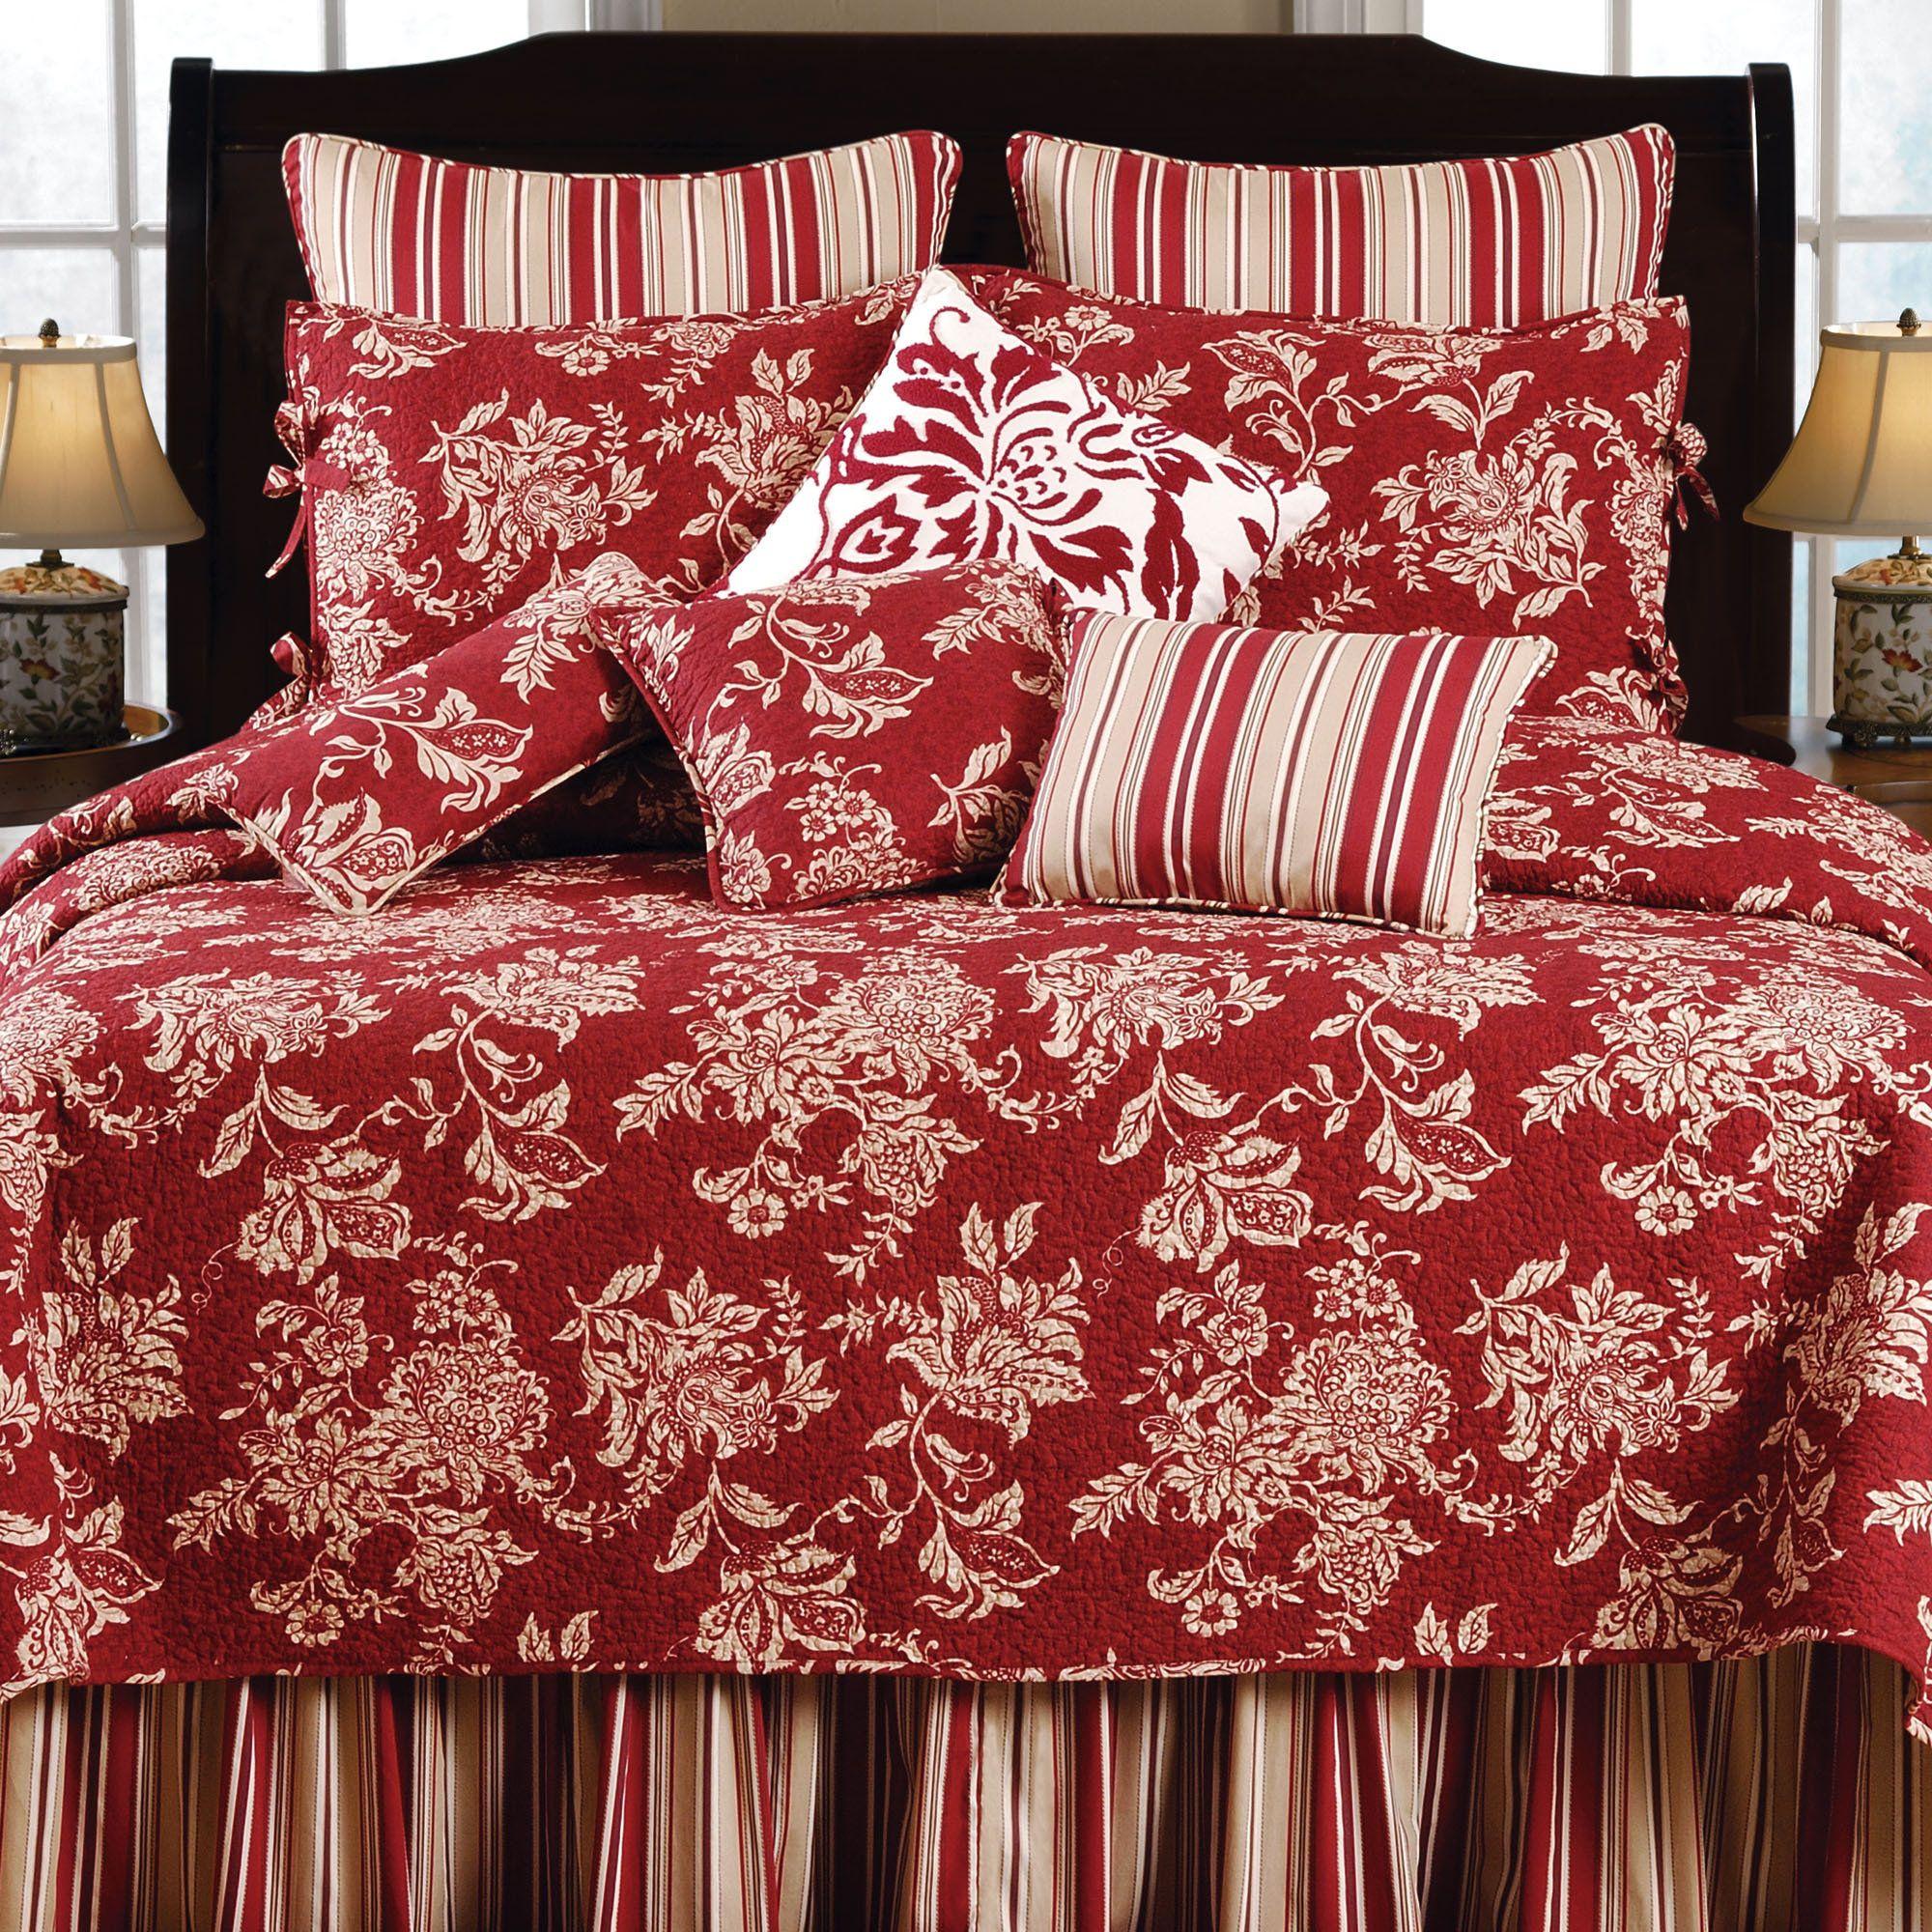 red bedding cover dreams quilt kids elmo sesame set street